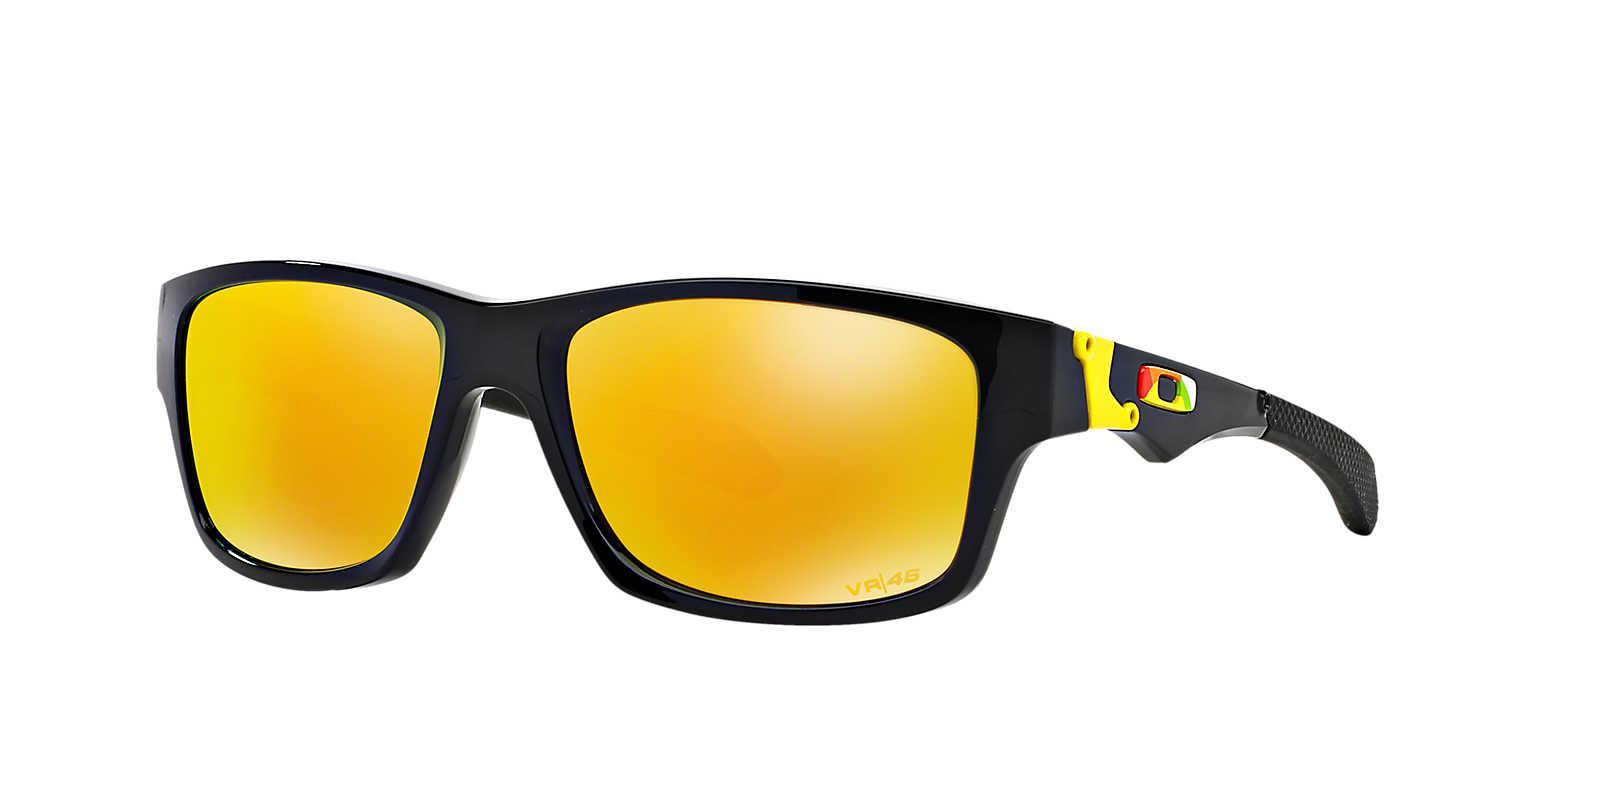 c02cfdddb44ef ... black vr46 w fire iridium lens sunglasses 6c9f6 9dc11  sweden oakley.  mens orange sunglass oo9135 jupiter squared f85d7 b85bb